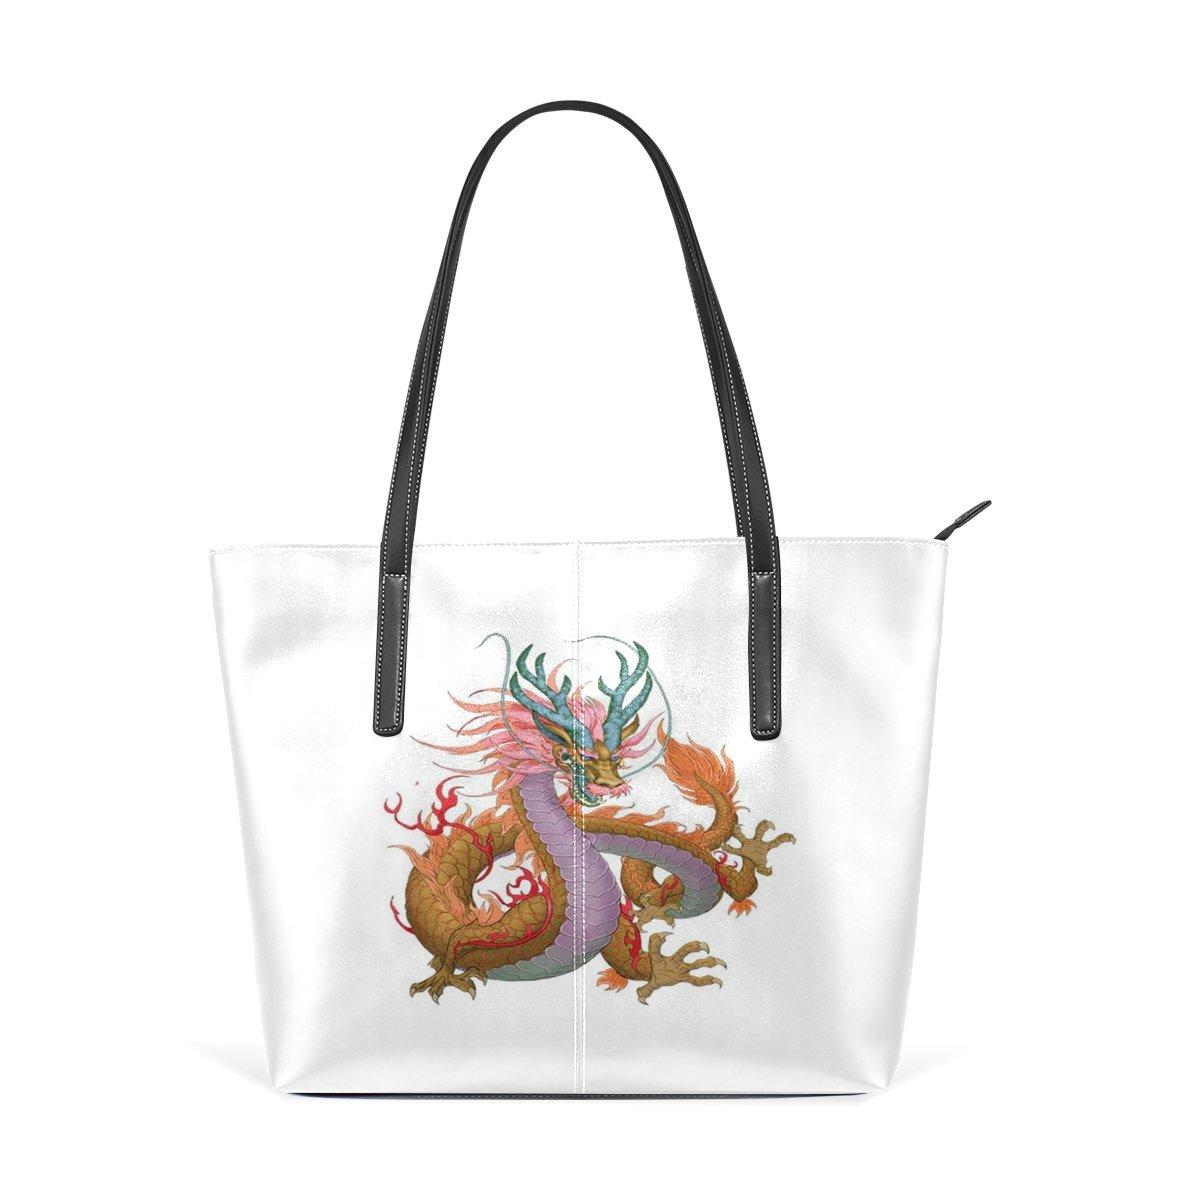 Women Leather Handbags Colorful Dragon Top Handle Shoulder Bags